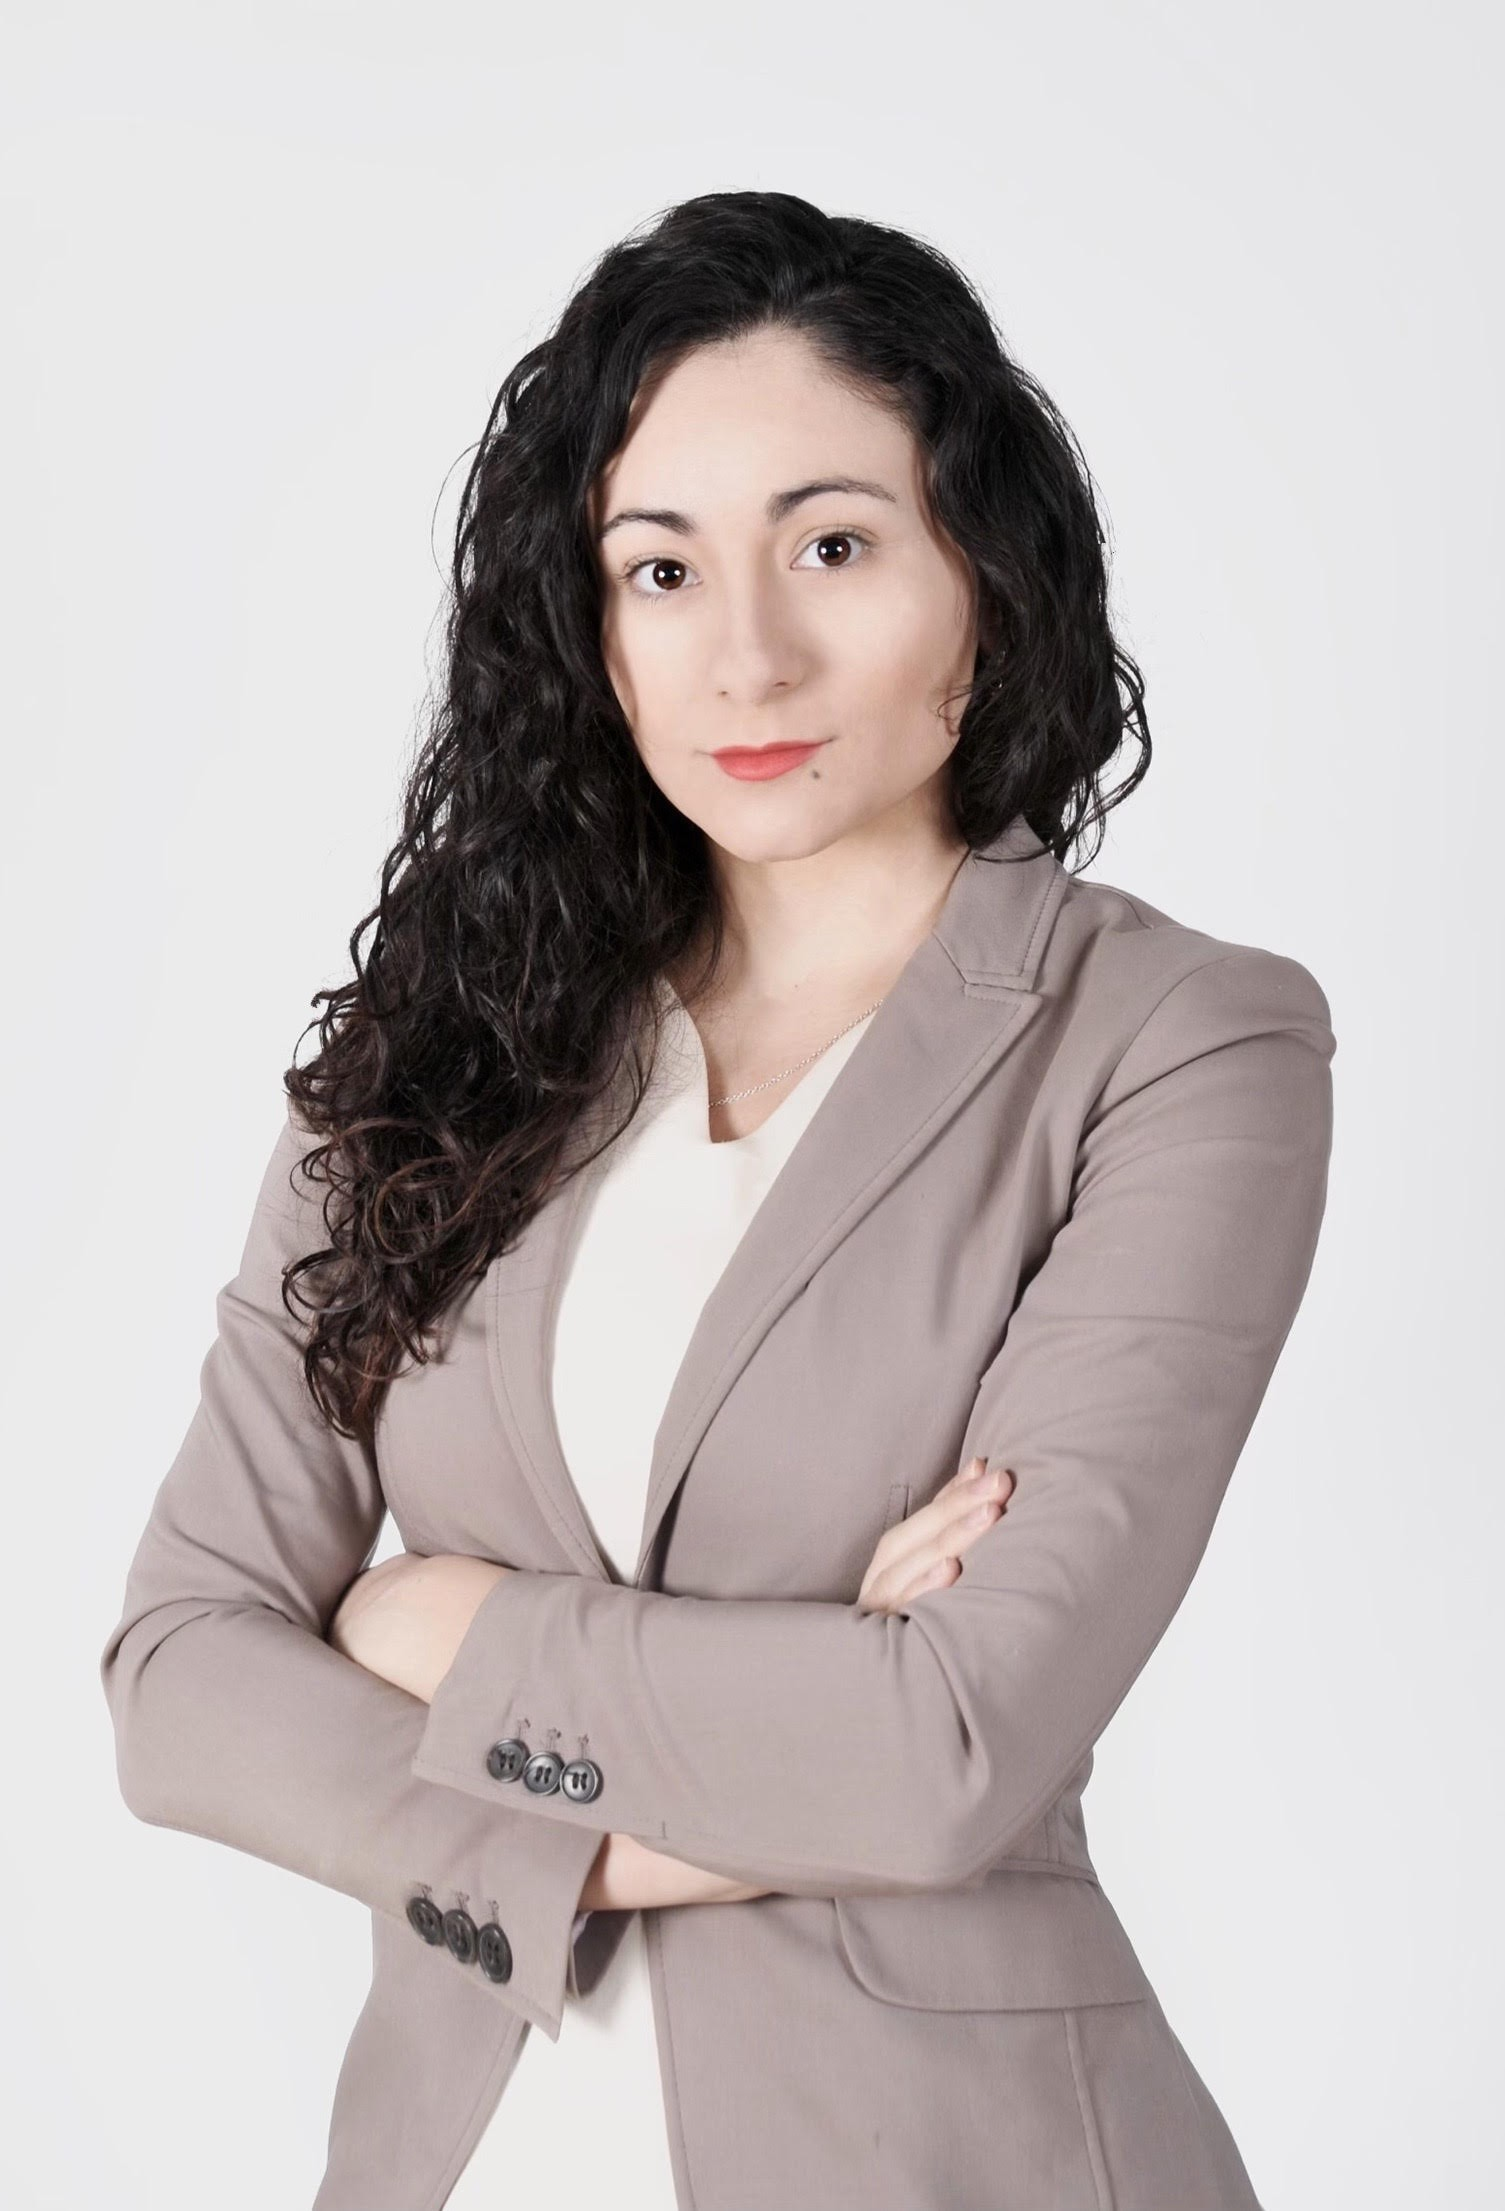 Miriam Moreno Martinez